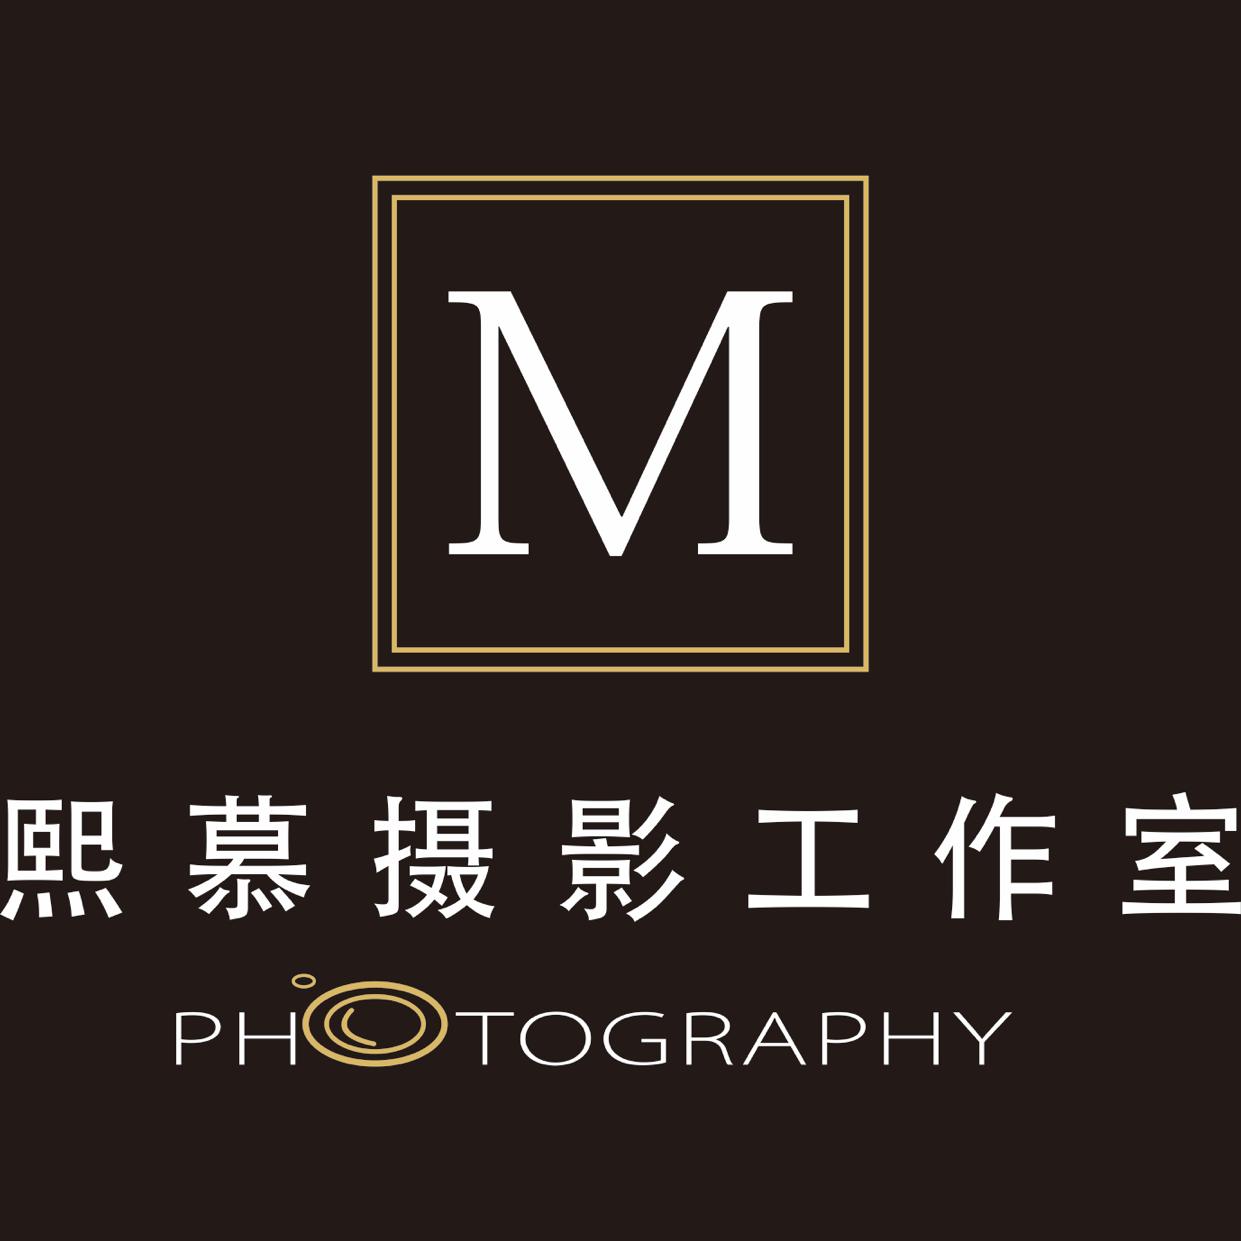 熙慕摄影工作室